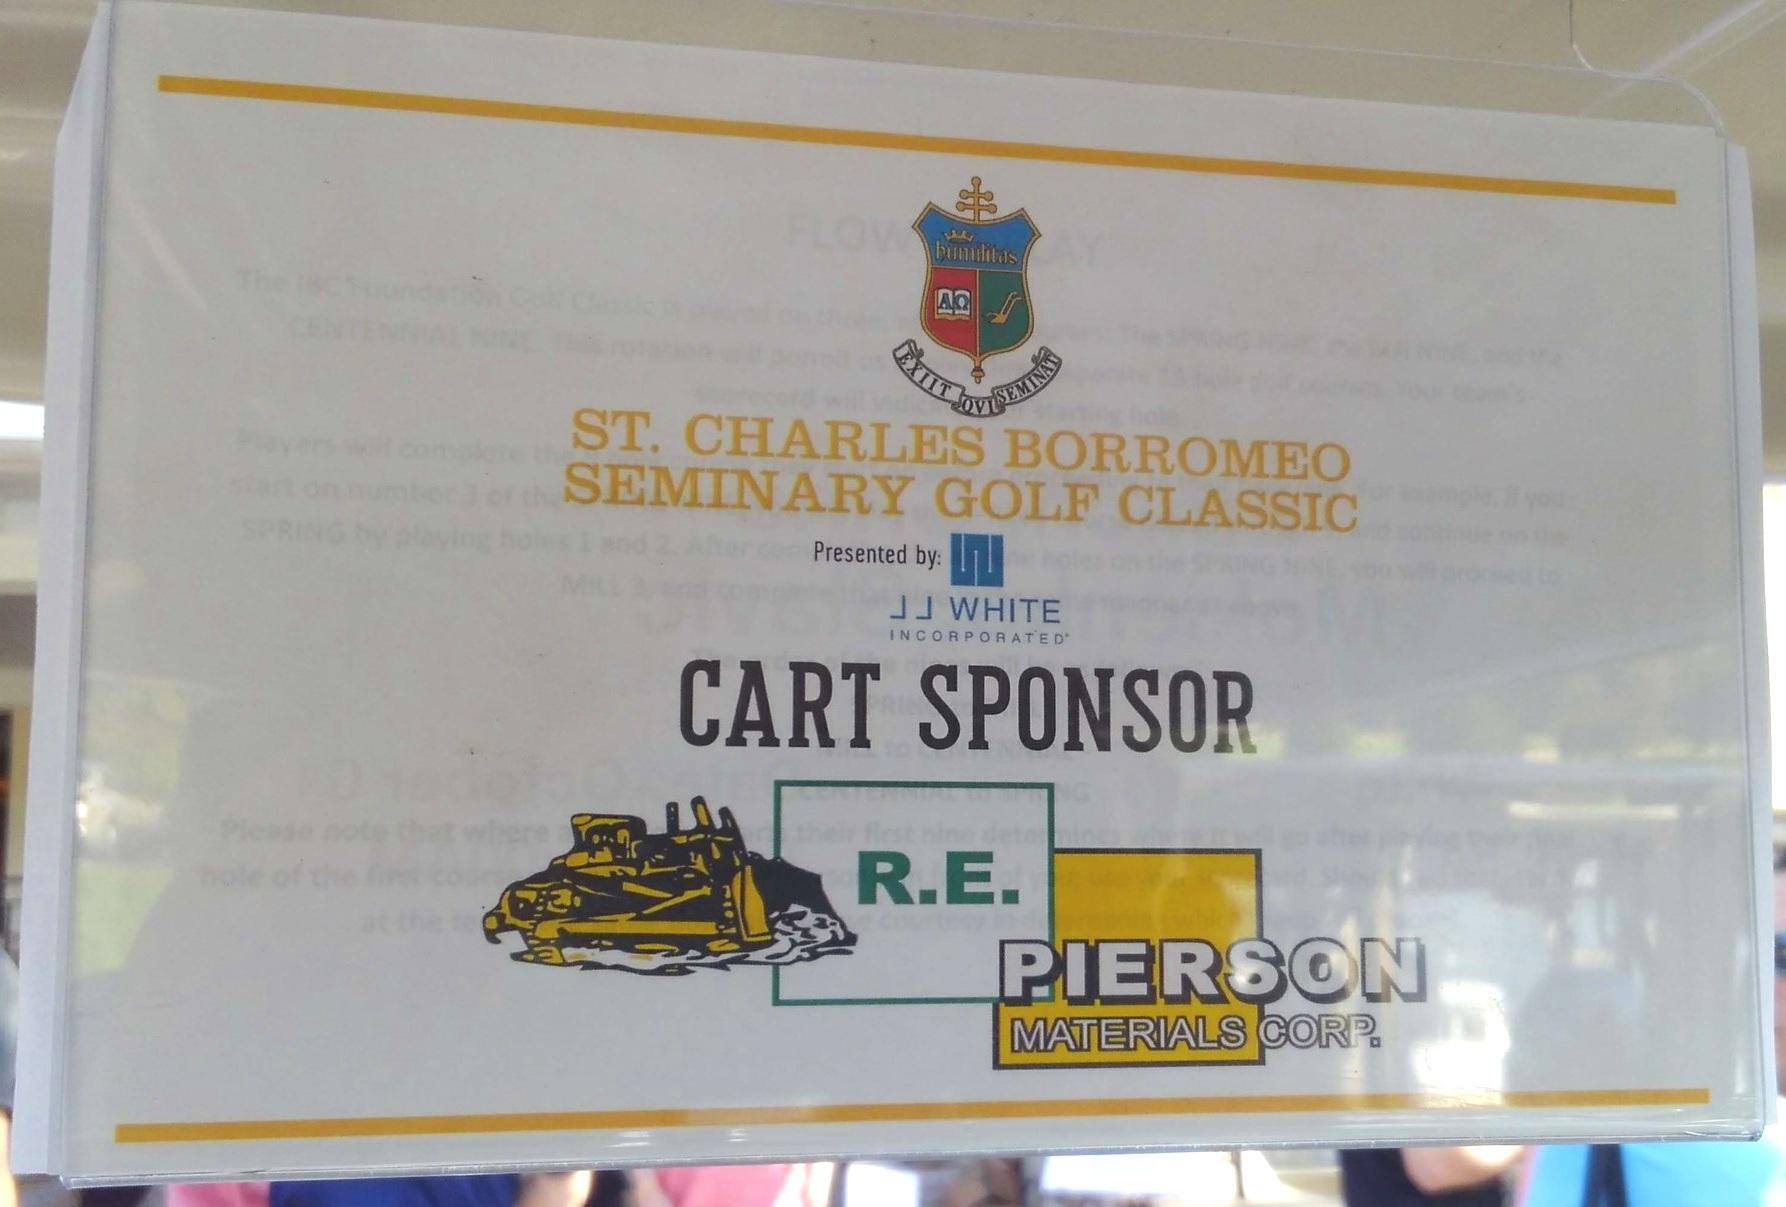 St. Charles Borromeo Seminary Golf Classic